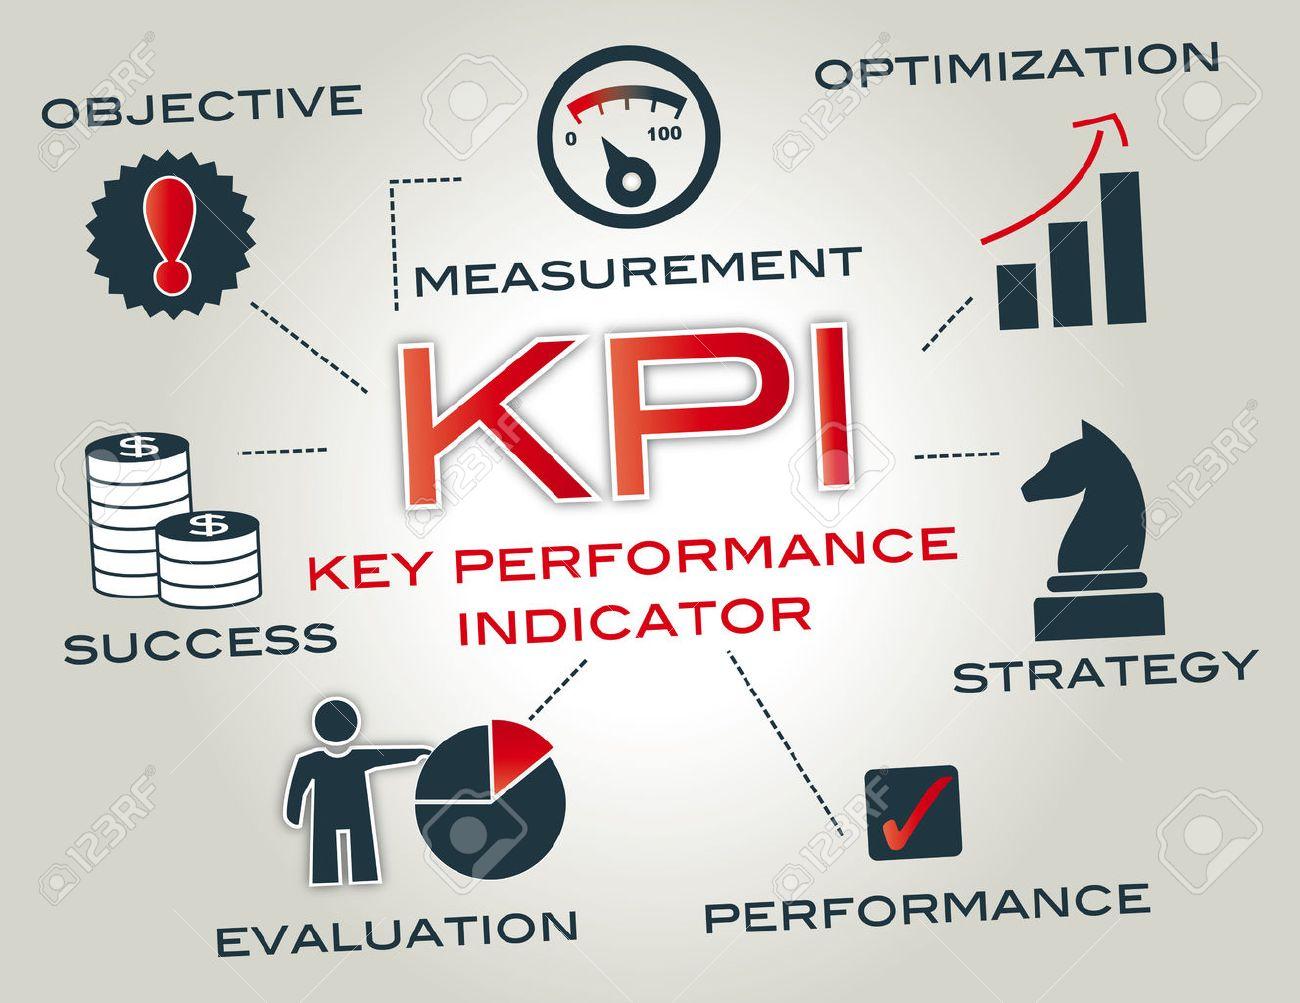 KPI - a performance indicator or key performance indicator is a type of performance measurement - 32569181